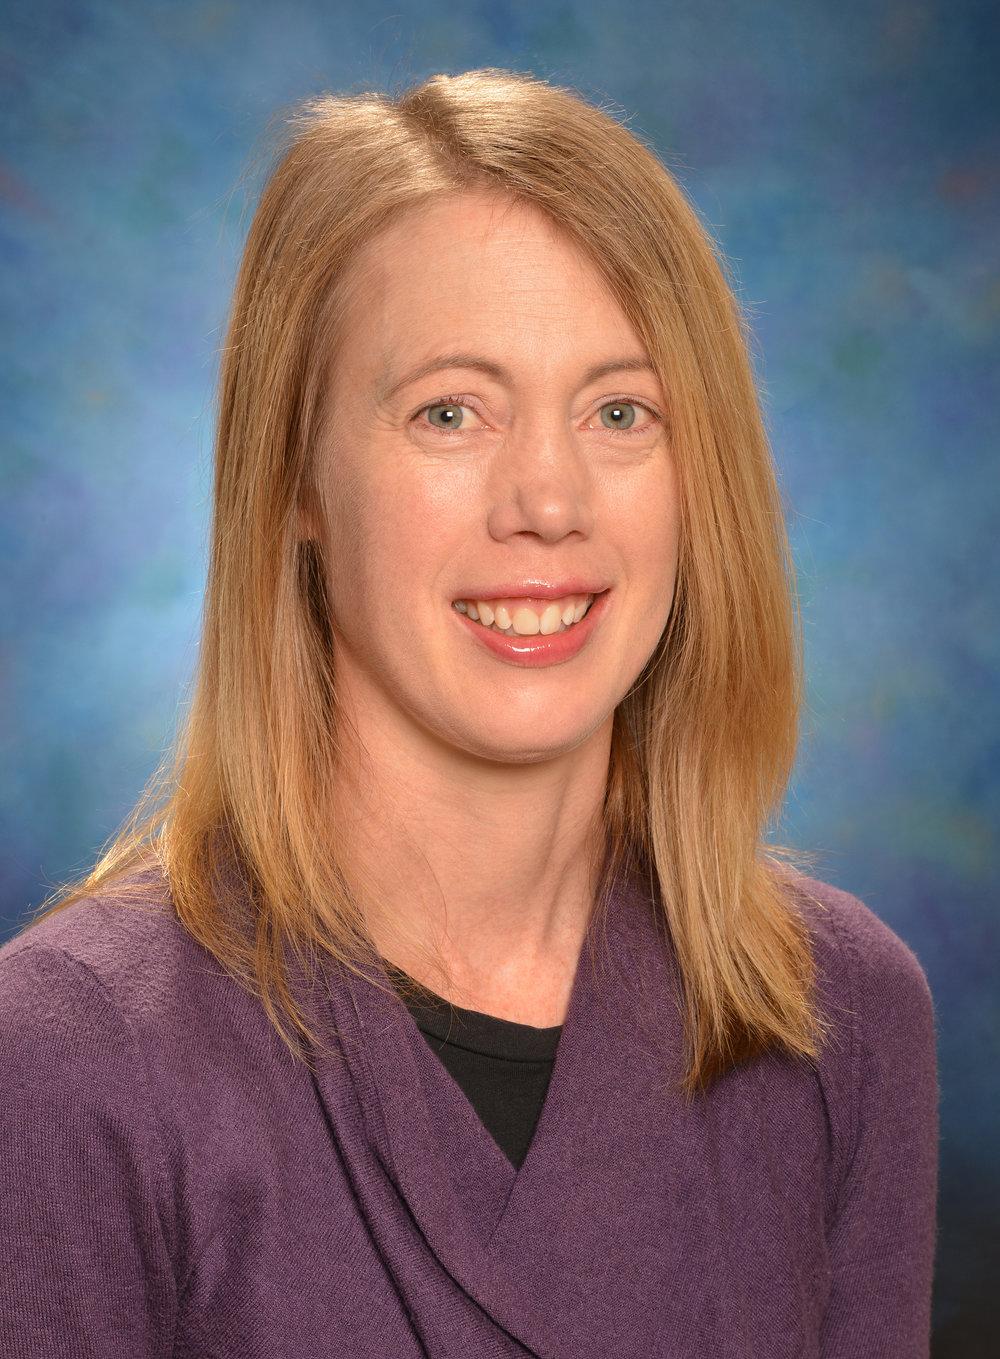 Dr Alison Funston, Monash University, Capability Leader